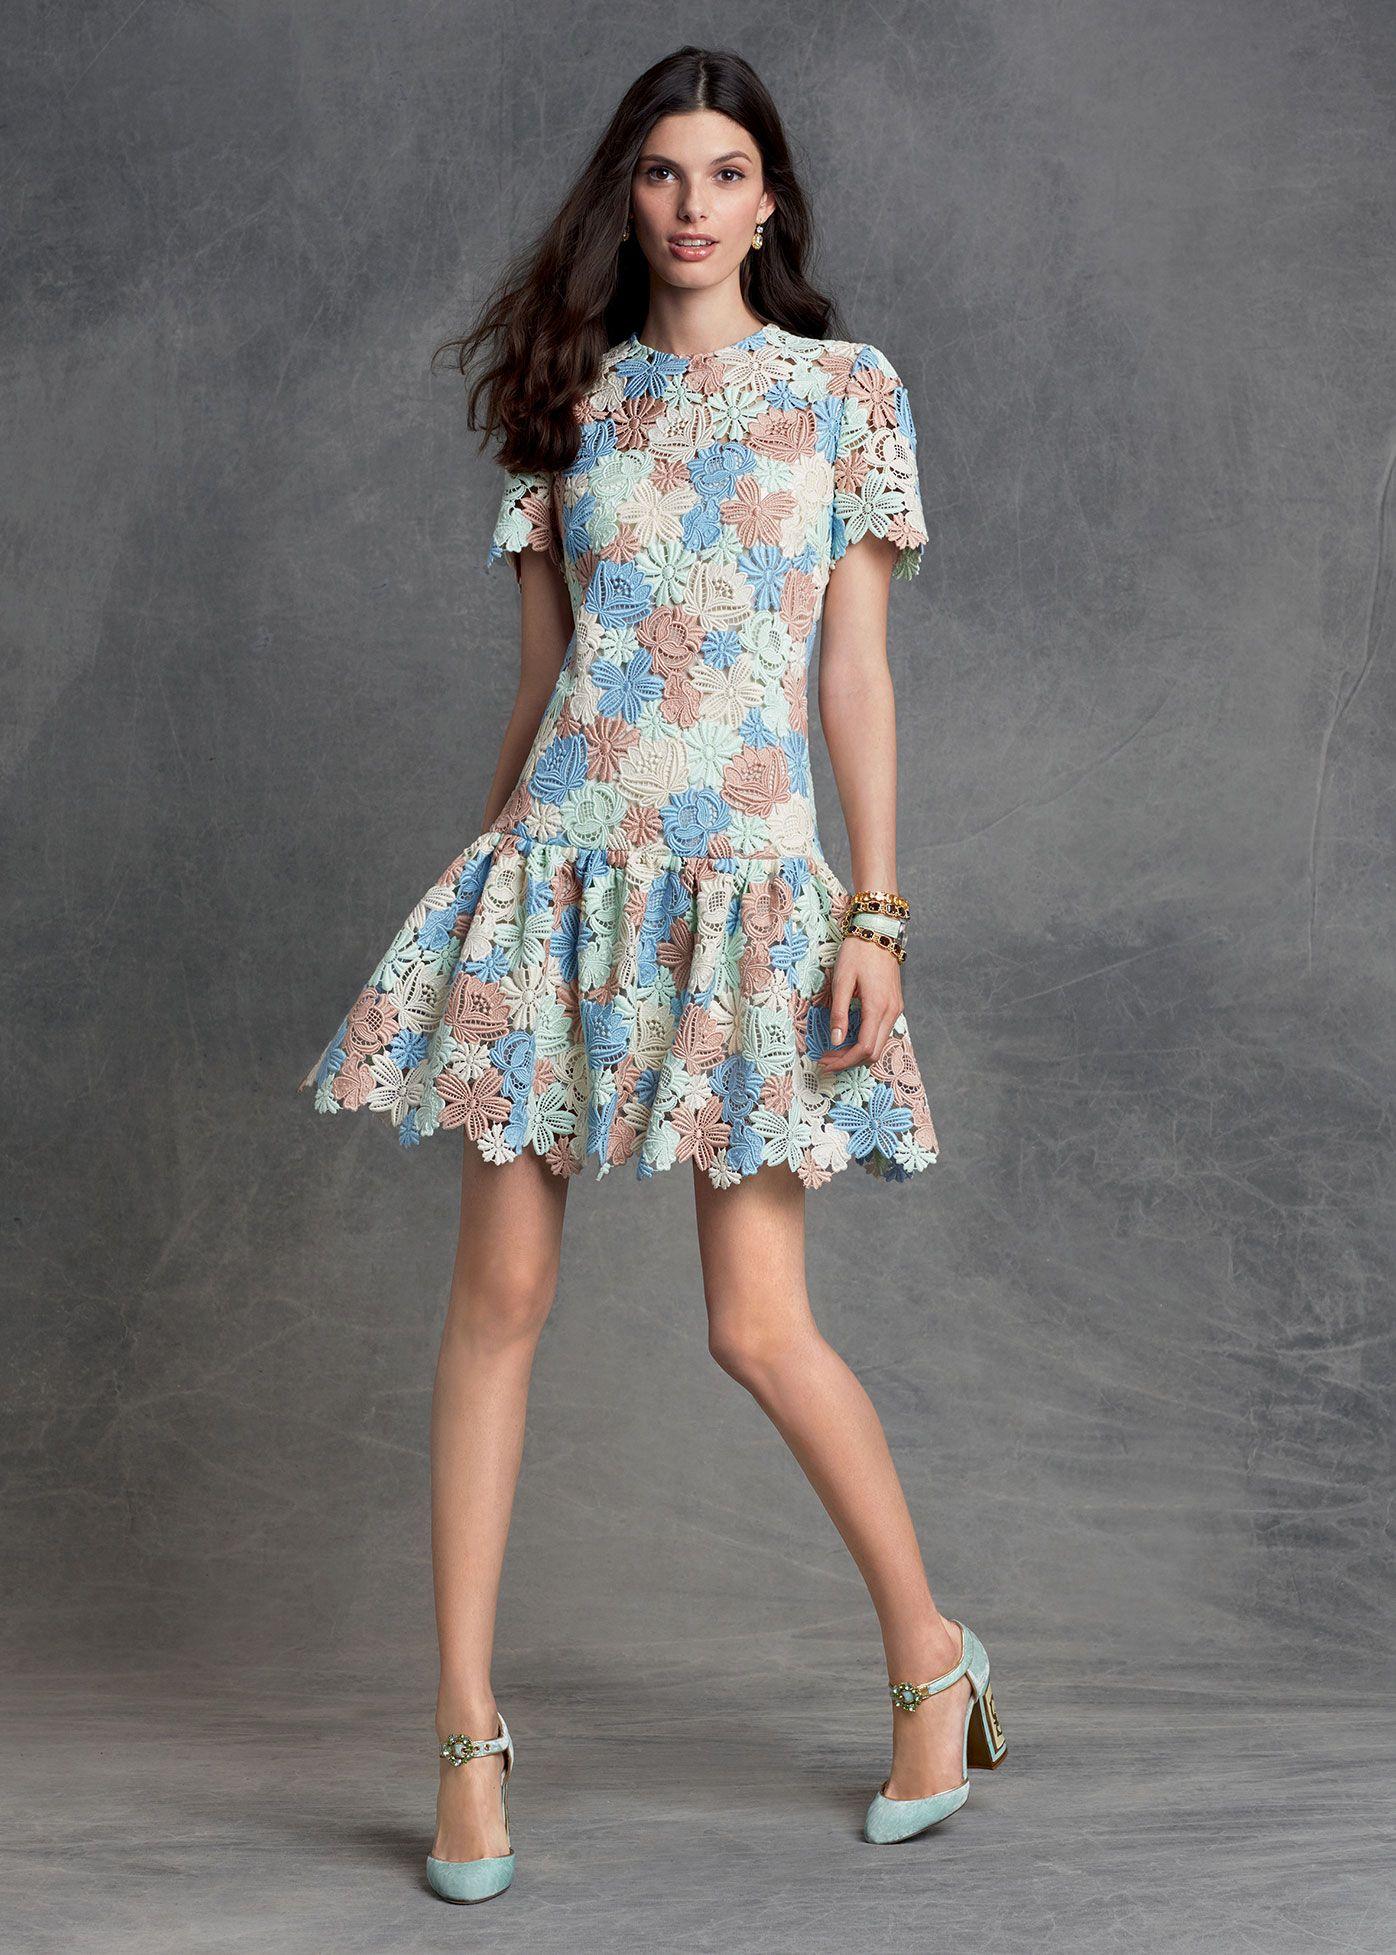 5d318316d1dc Dolce   Gabbana Abbigliamento Donna Inverno 2016 Moda Gonna